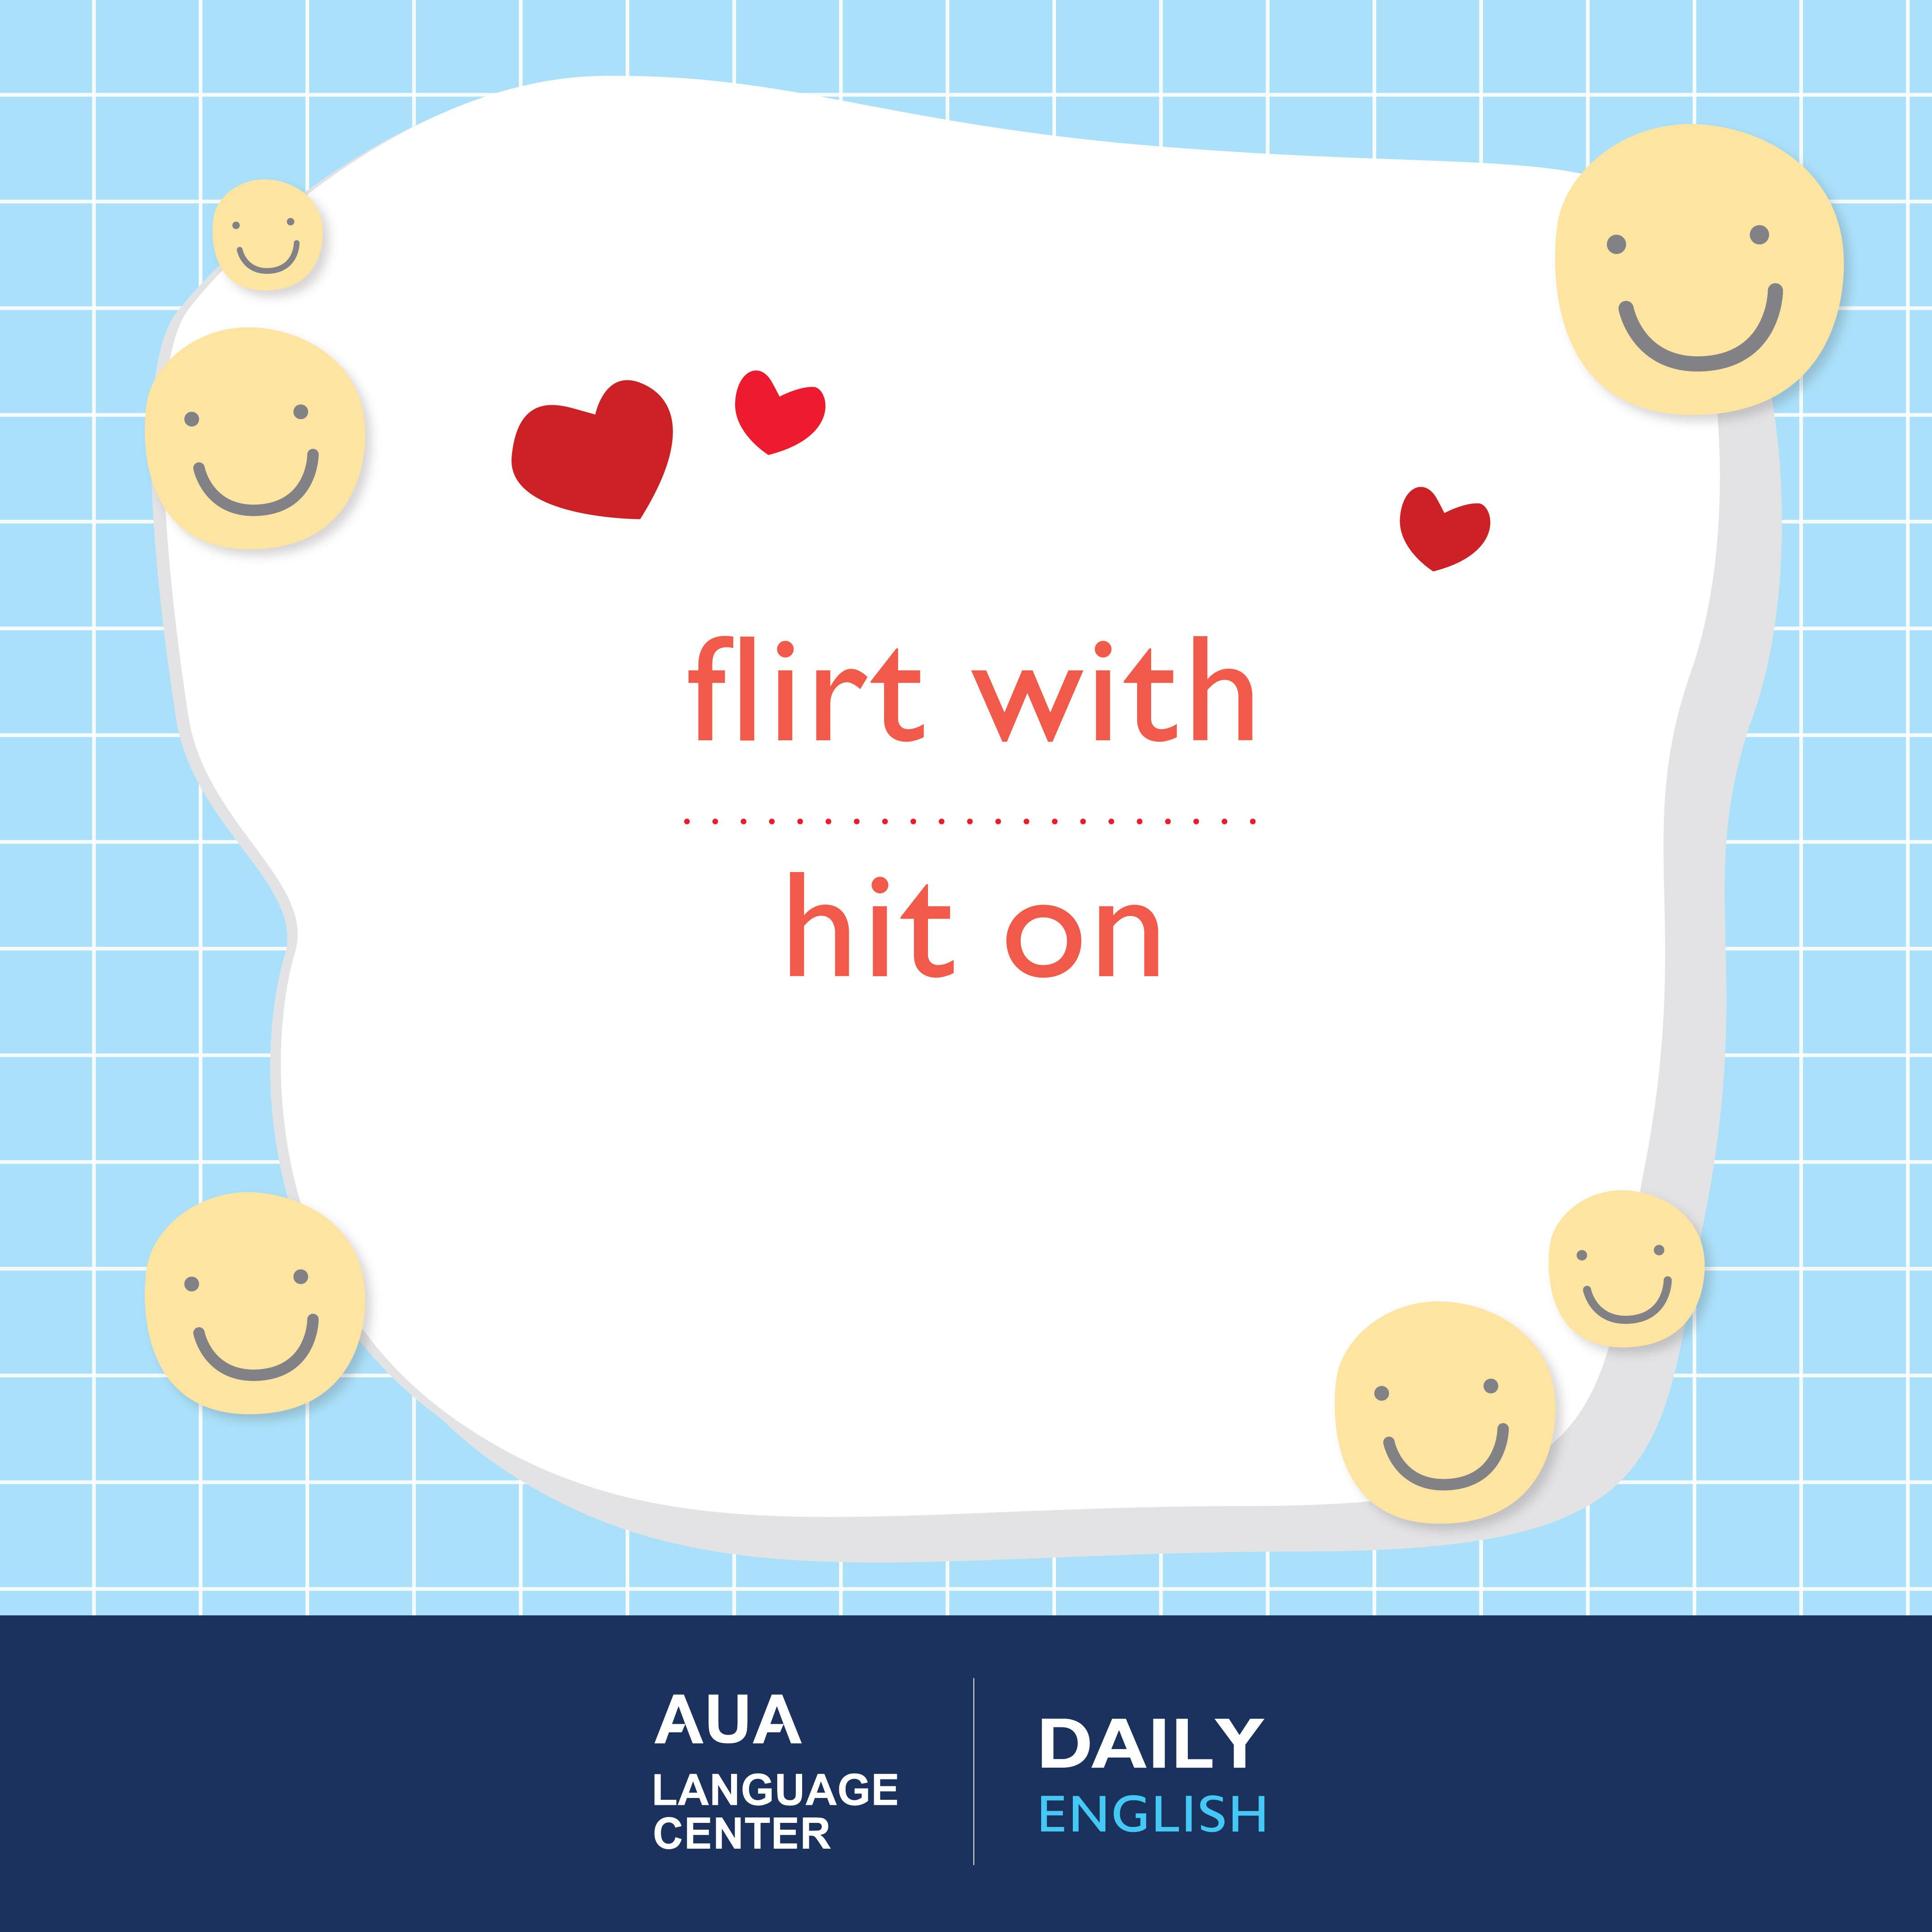 flirt with , hit on